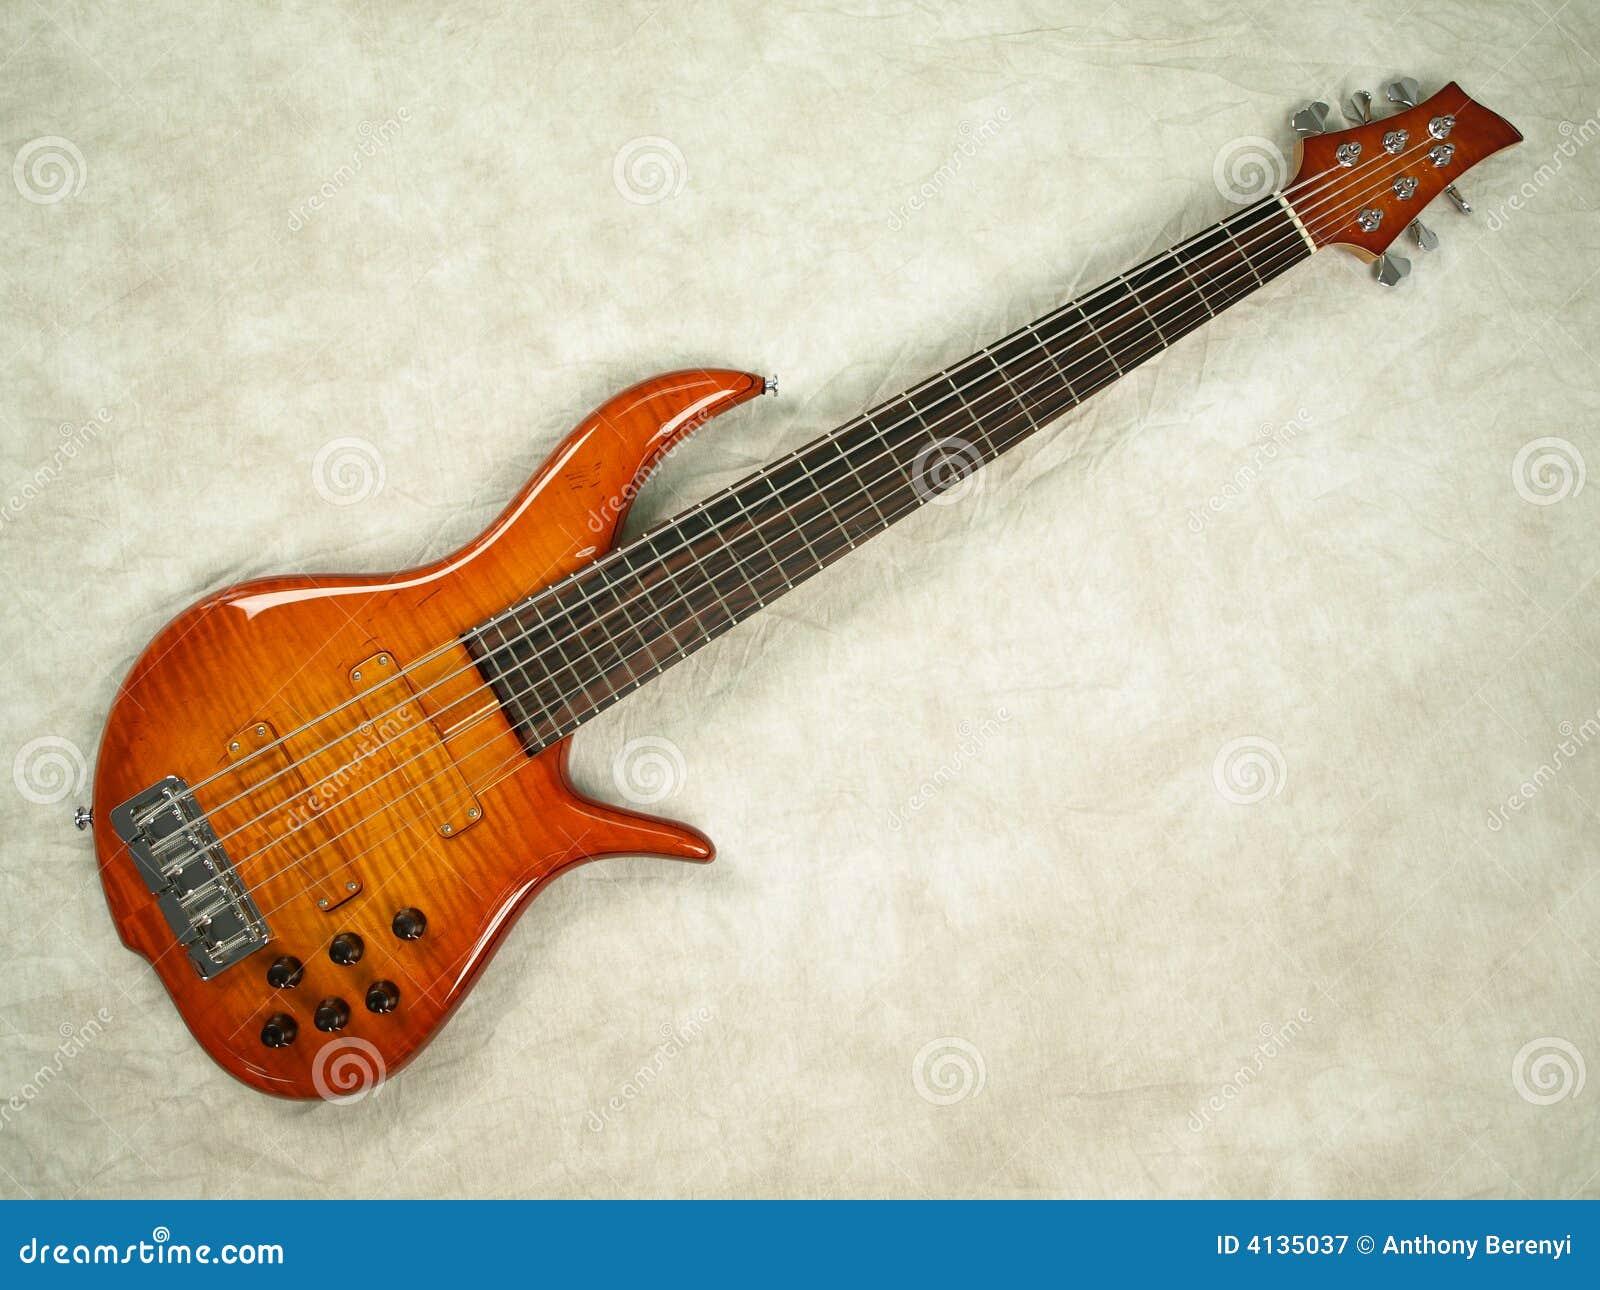 Bass guitar honey color full